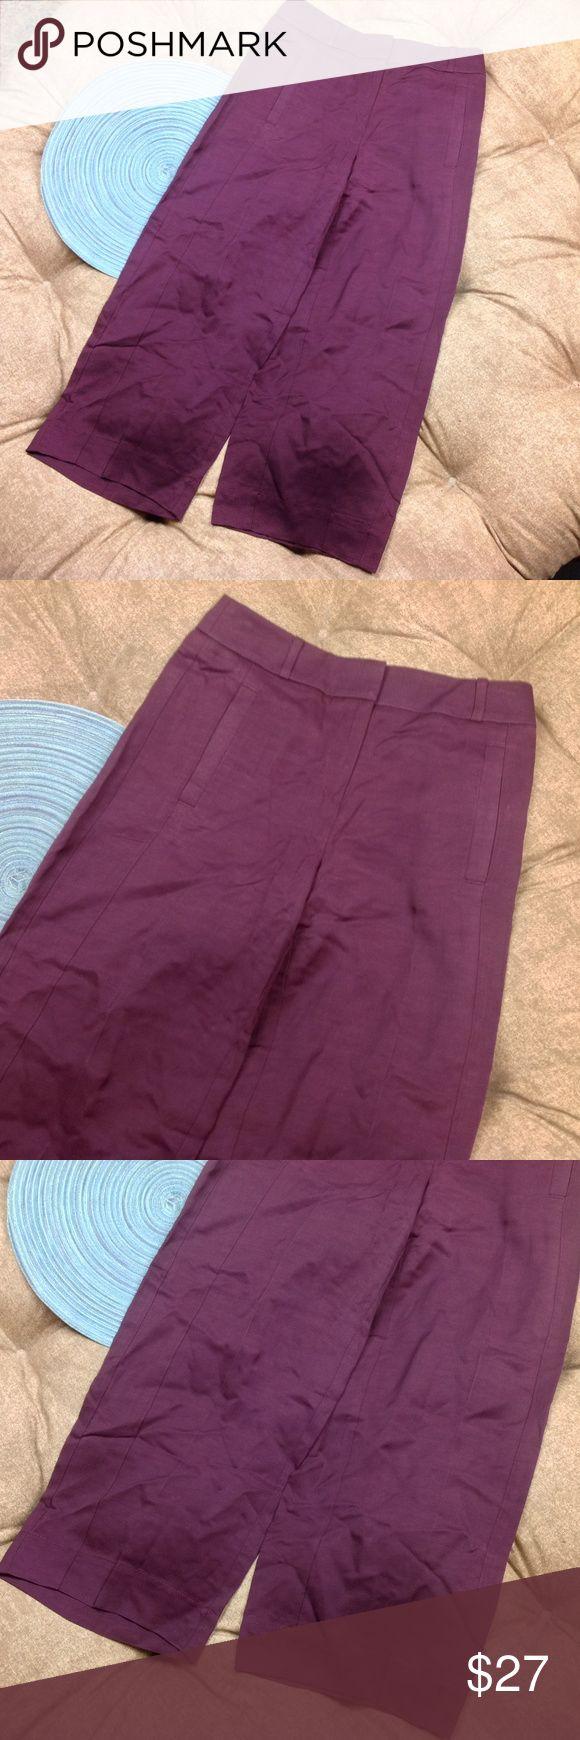 Ann Taylor LOFT Dress Pants Woman 00P Plum Purple New with tags; Ann Taylor LOFT Dress Pants Woman 00P Plum Purple Wide Leg Trouser Cropped; 81/19 Rayon/Linen; 23 inch inseam; 13.5 inch across waist; 10 inch rise Ann Taylor Pants Wide Leg